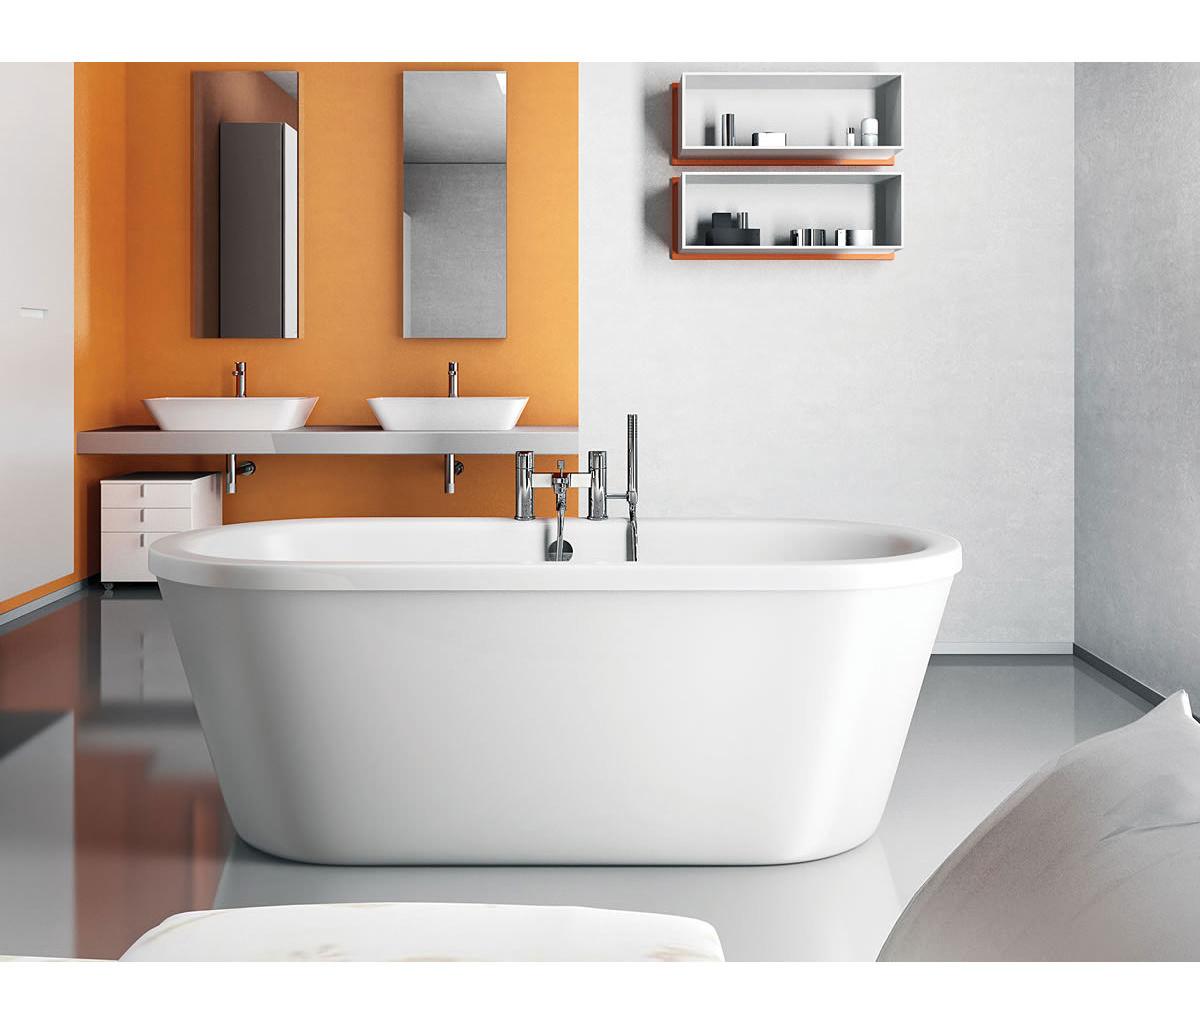 Clearwater nouveau modern freestanding bath 1780 x 810mm m1a for Bathroom design kilmarnock